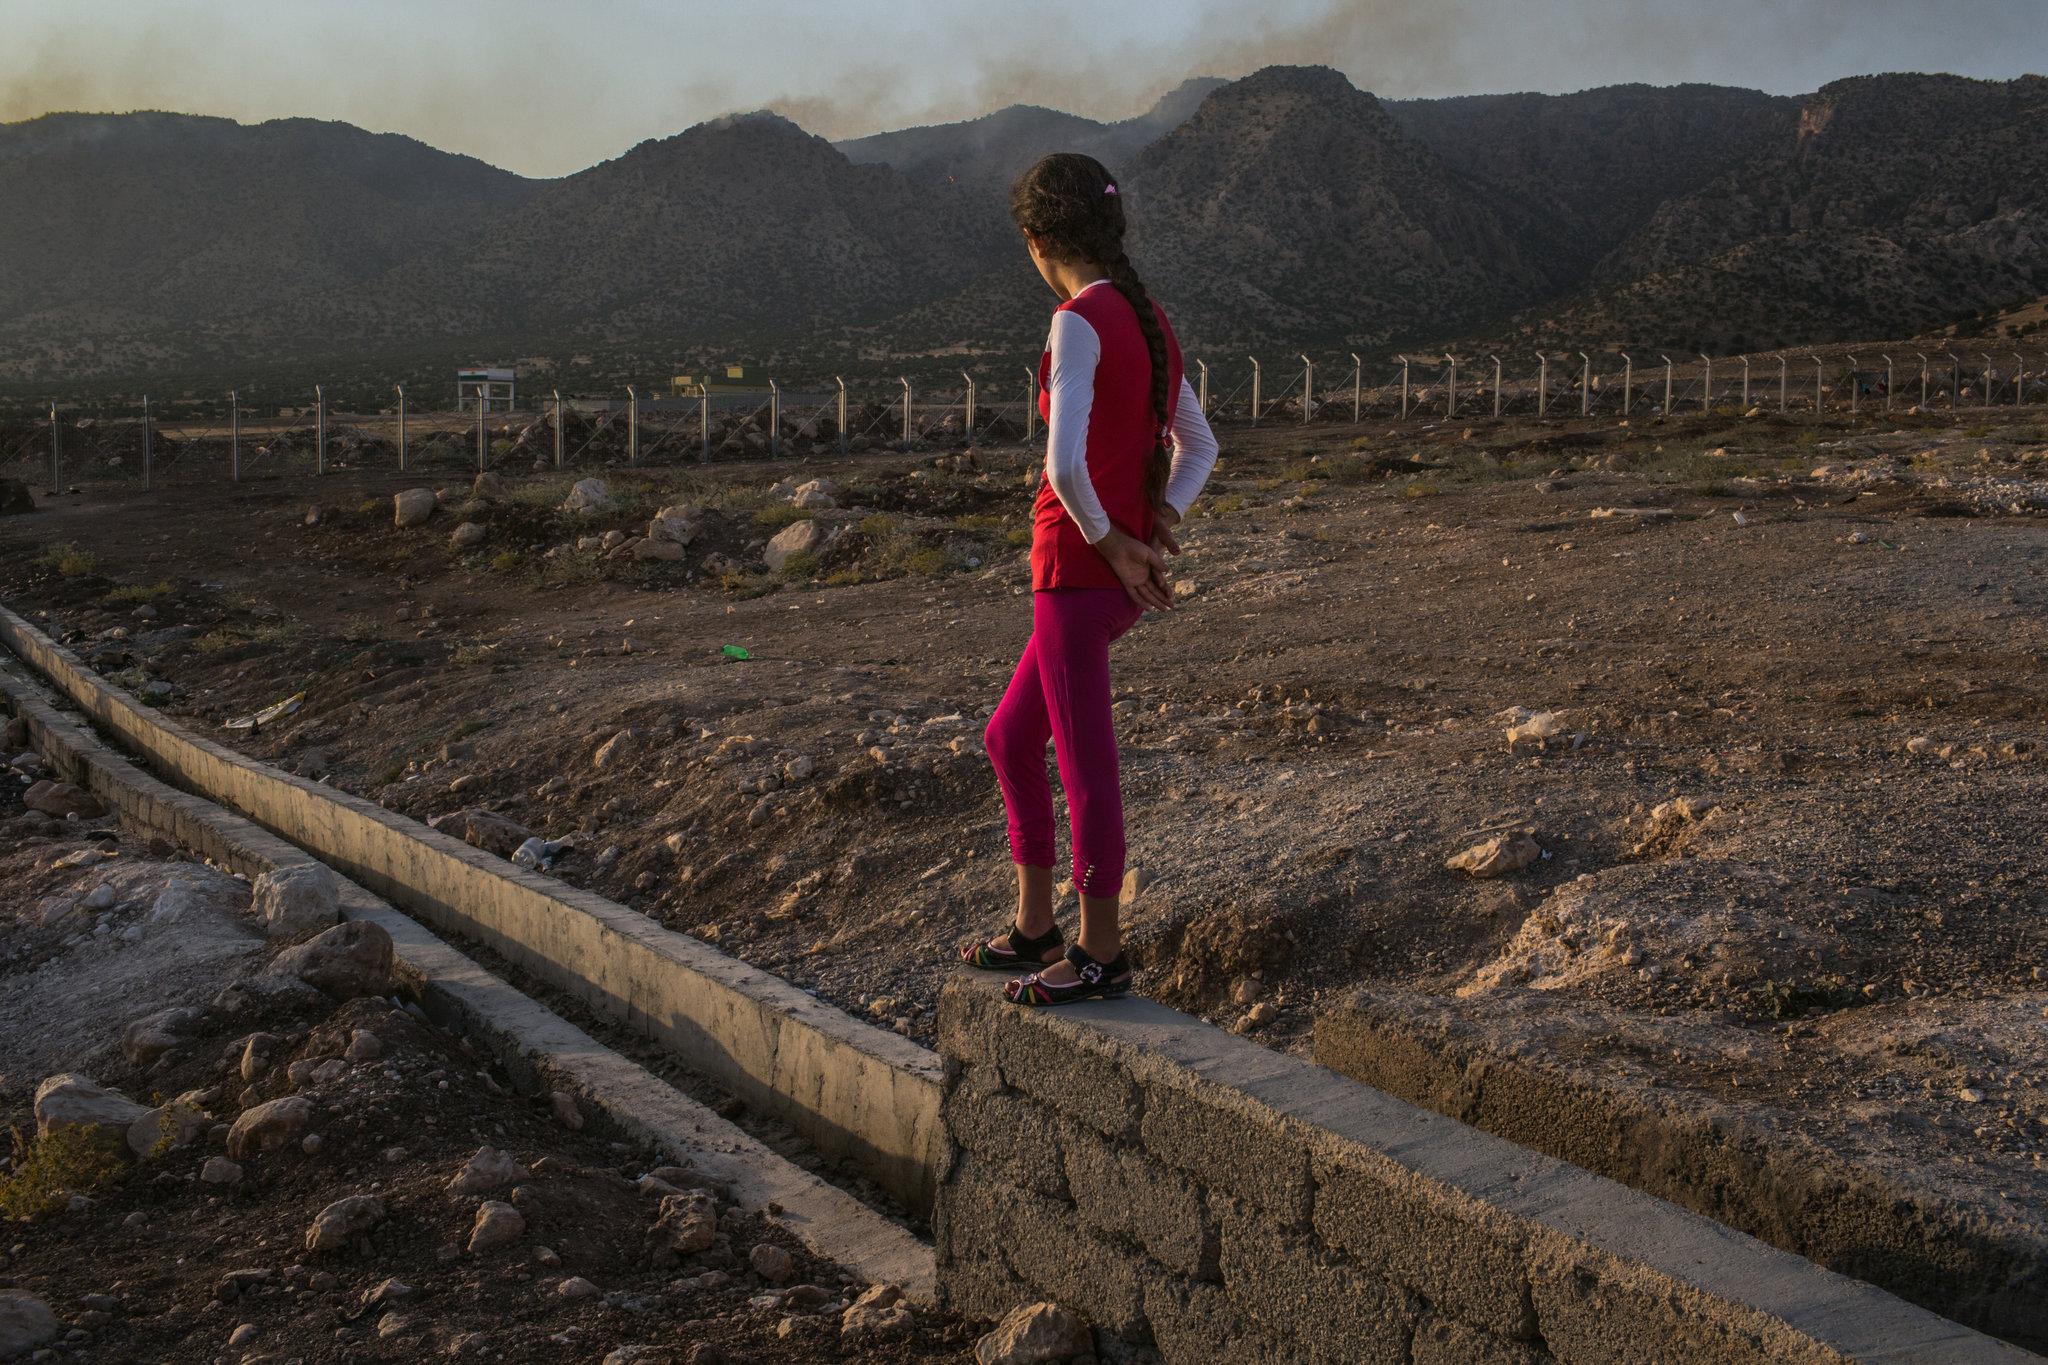 ISIS Enshrines a Theology of Rape  8/24/15